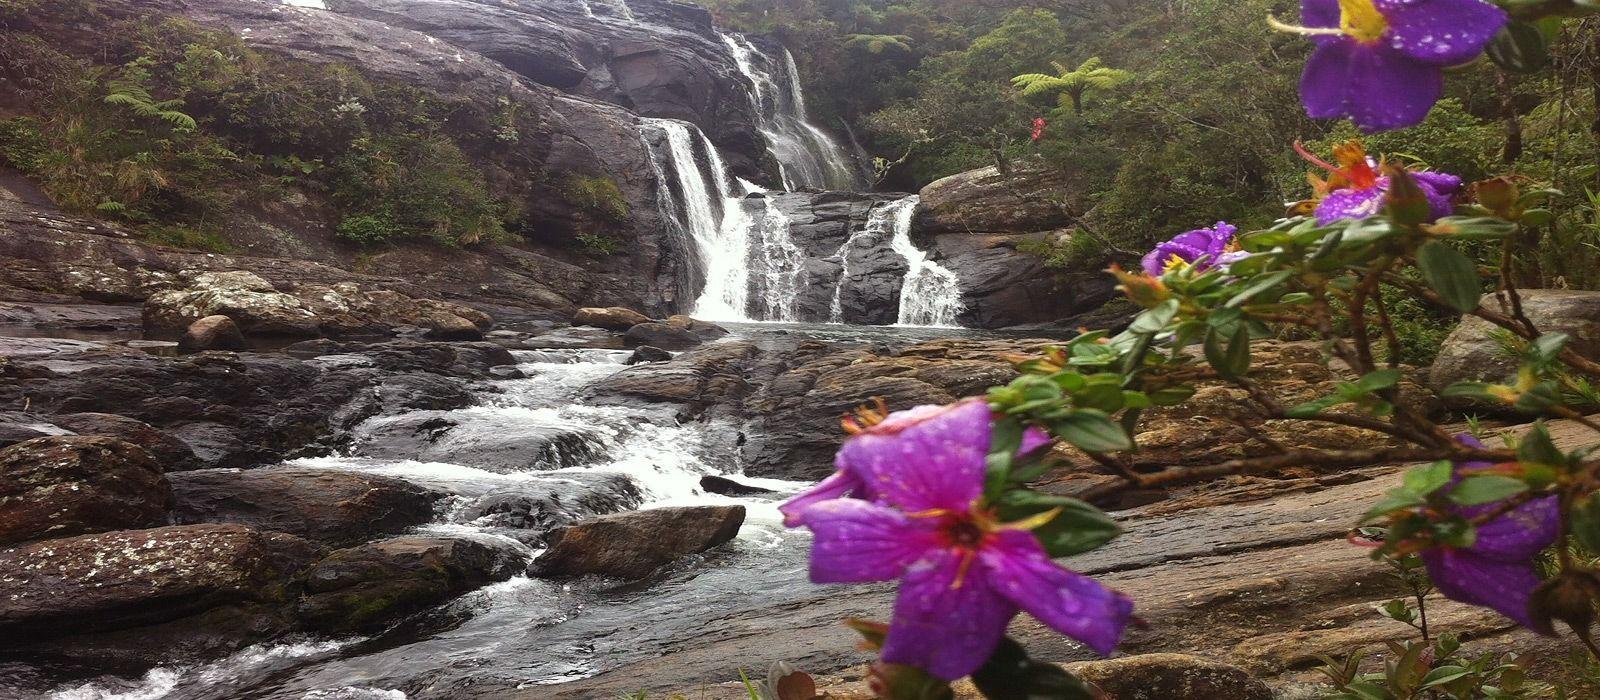 Exclusive Travel Tips for Your Destination Nuwara Eliya in